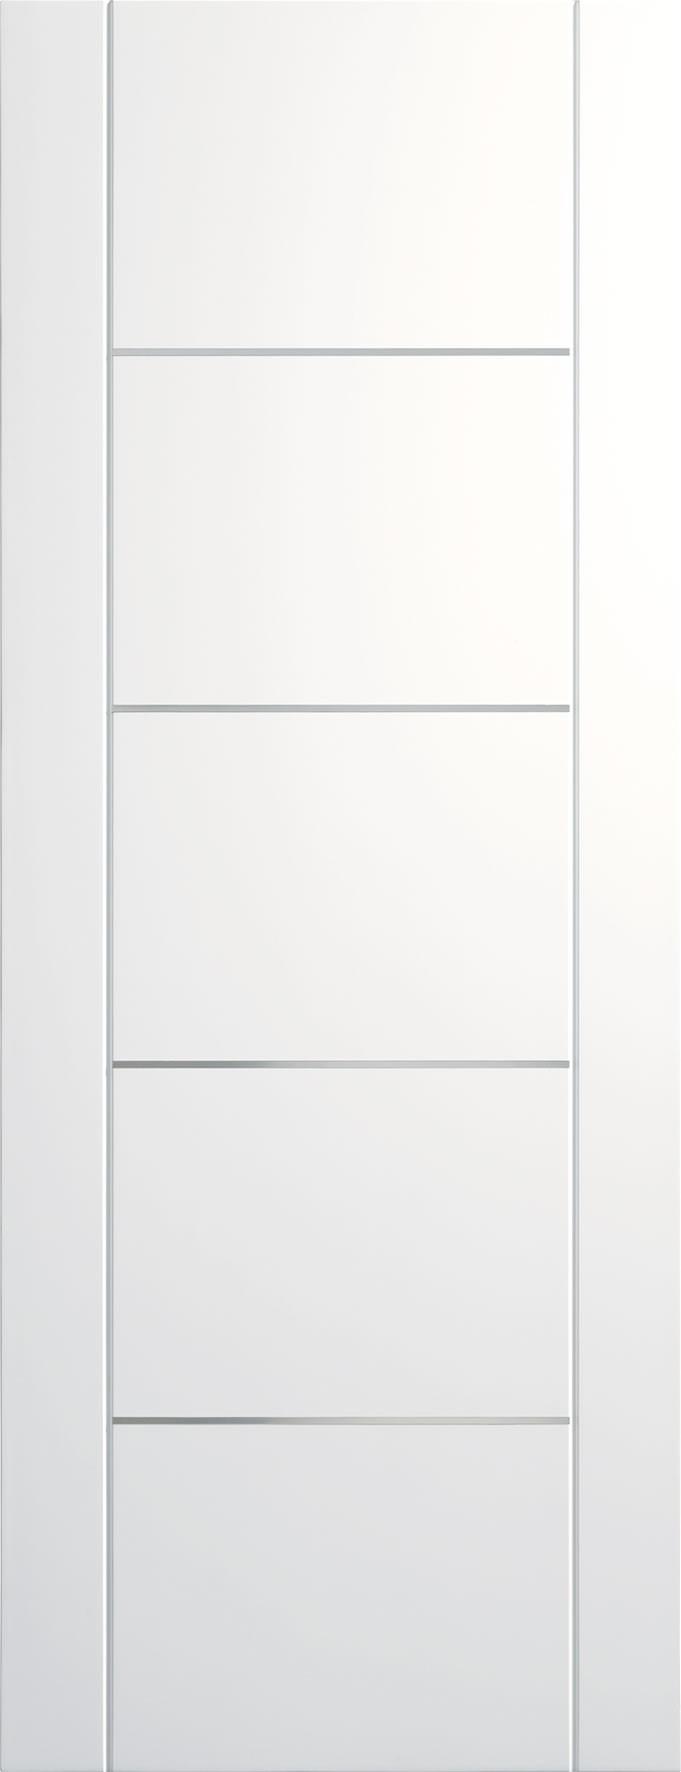 XL JOINERY DOORS -  PFWFPOR30-FD Pre-Finished Internal White Portici (Alum Inlay) Fire Door  PFWFPOR30-FD